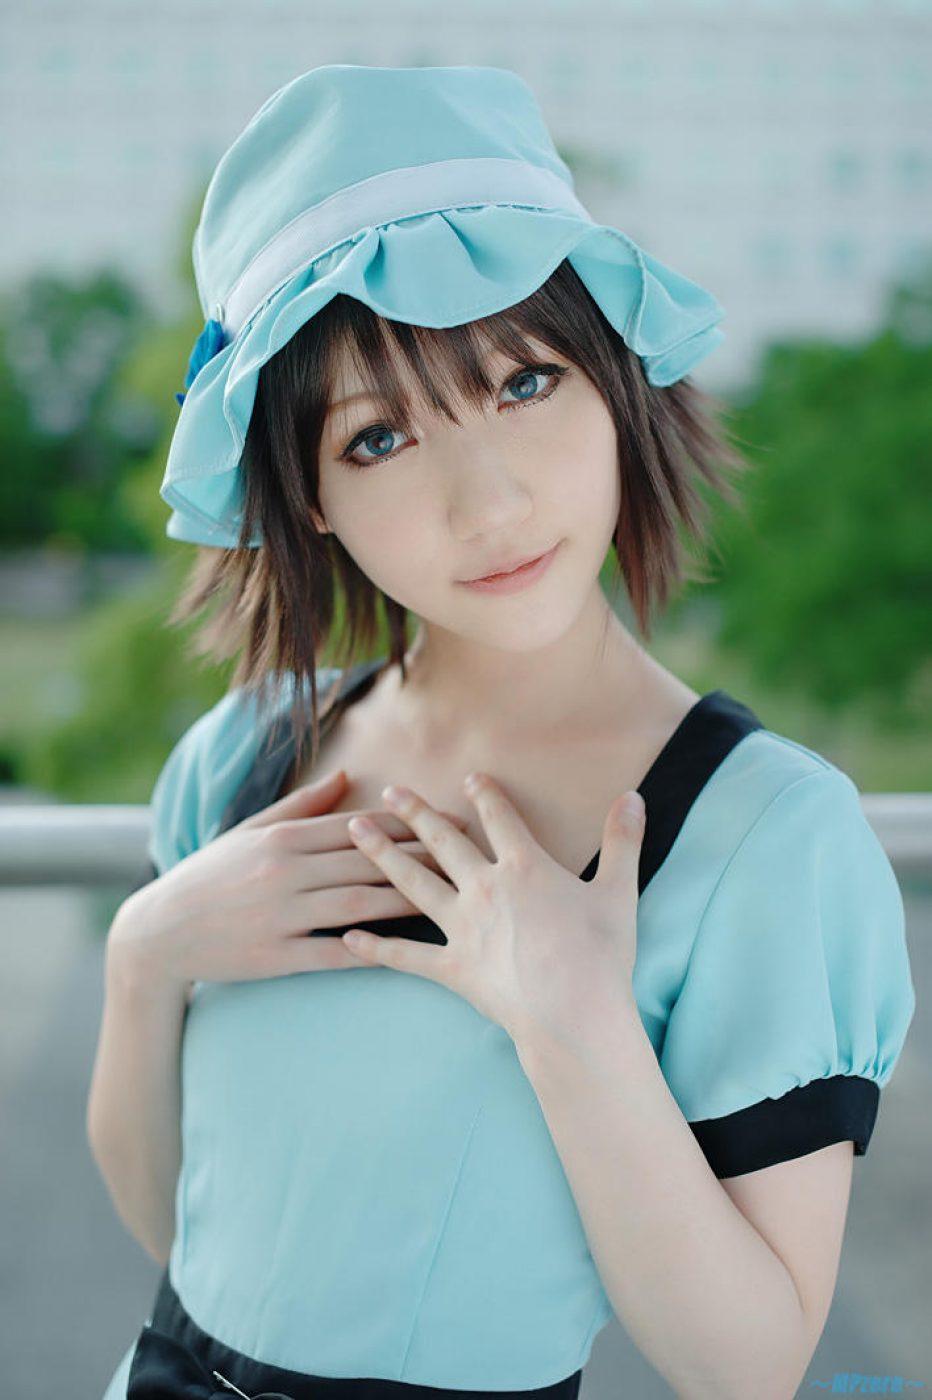 SteinsGate-Shiina-Mayuri-Cosplay-Gamers-Heroes-5.jpg